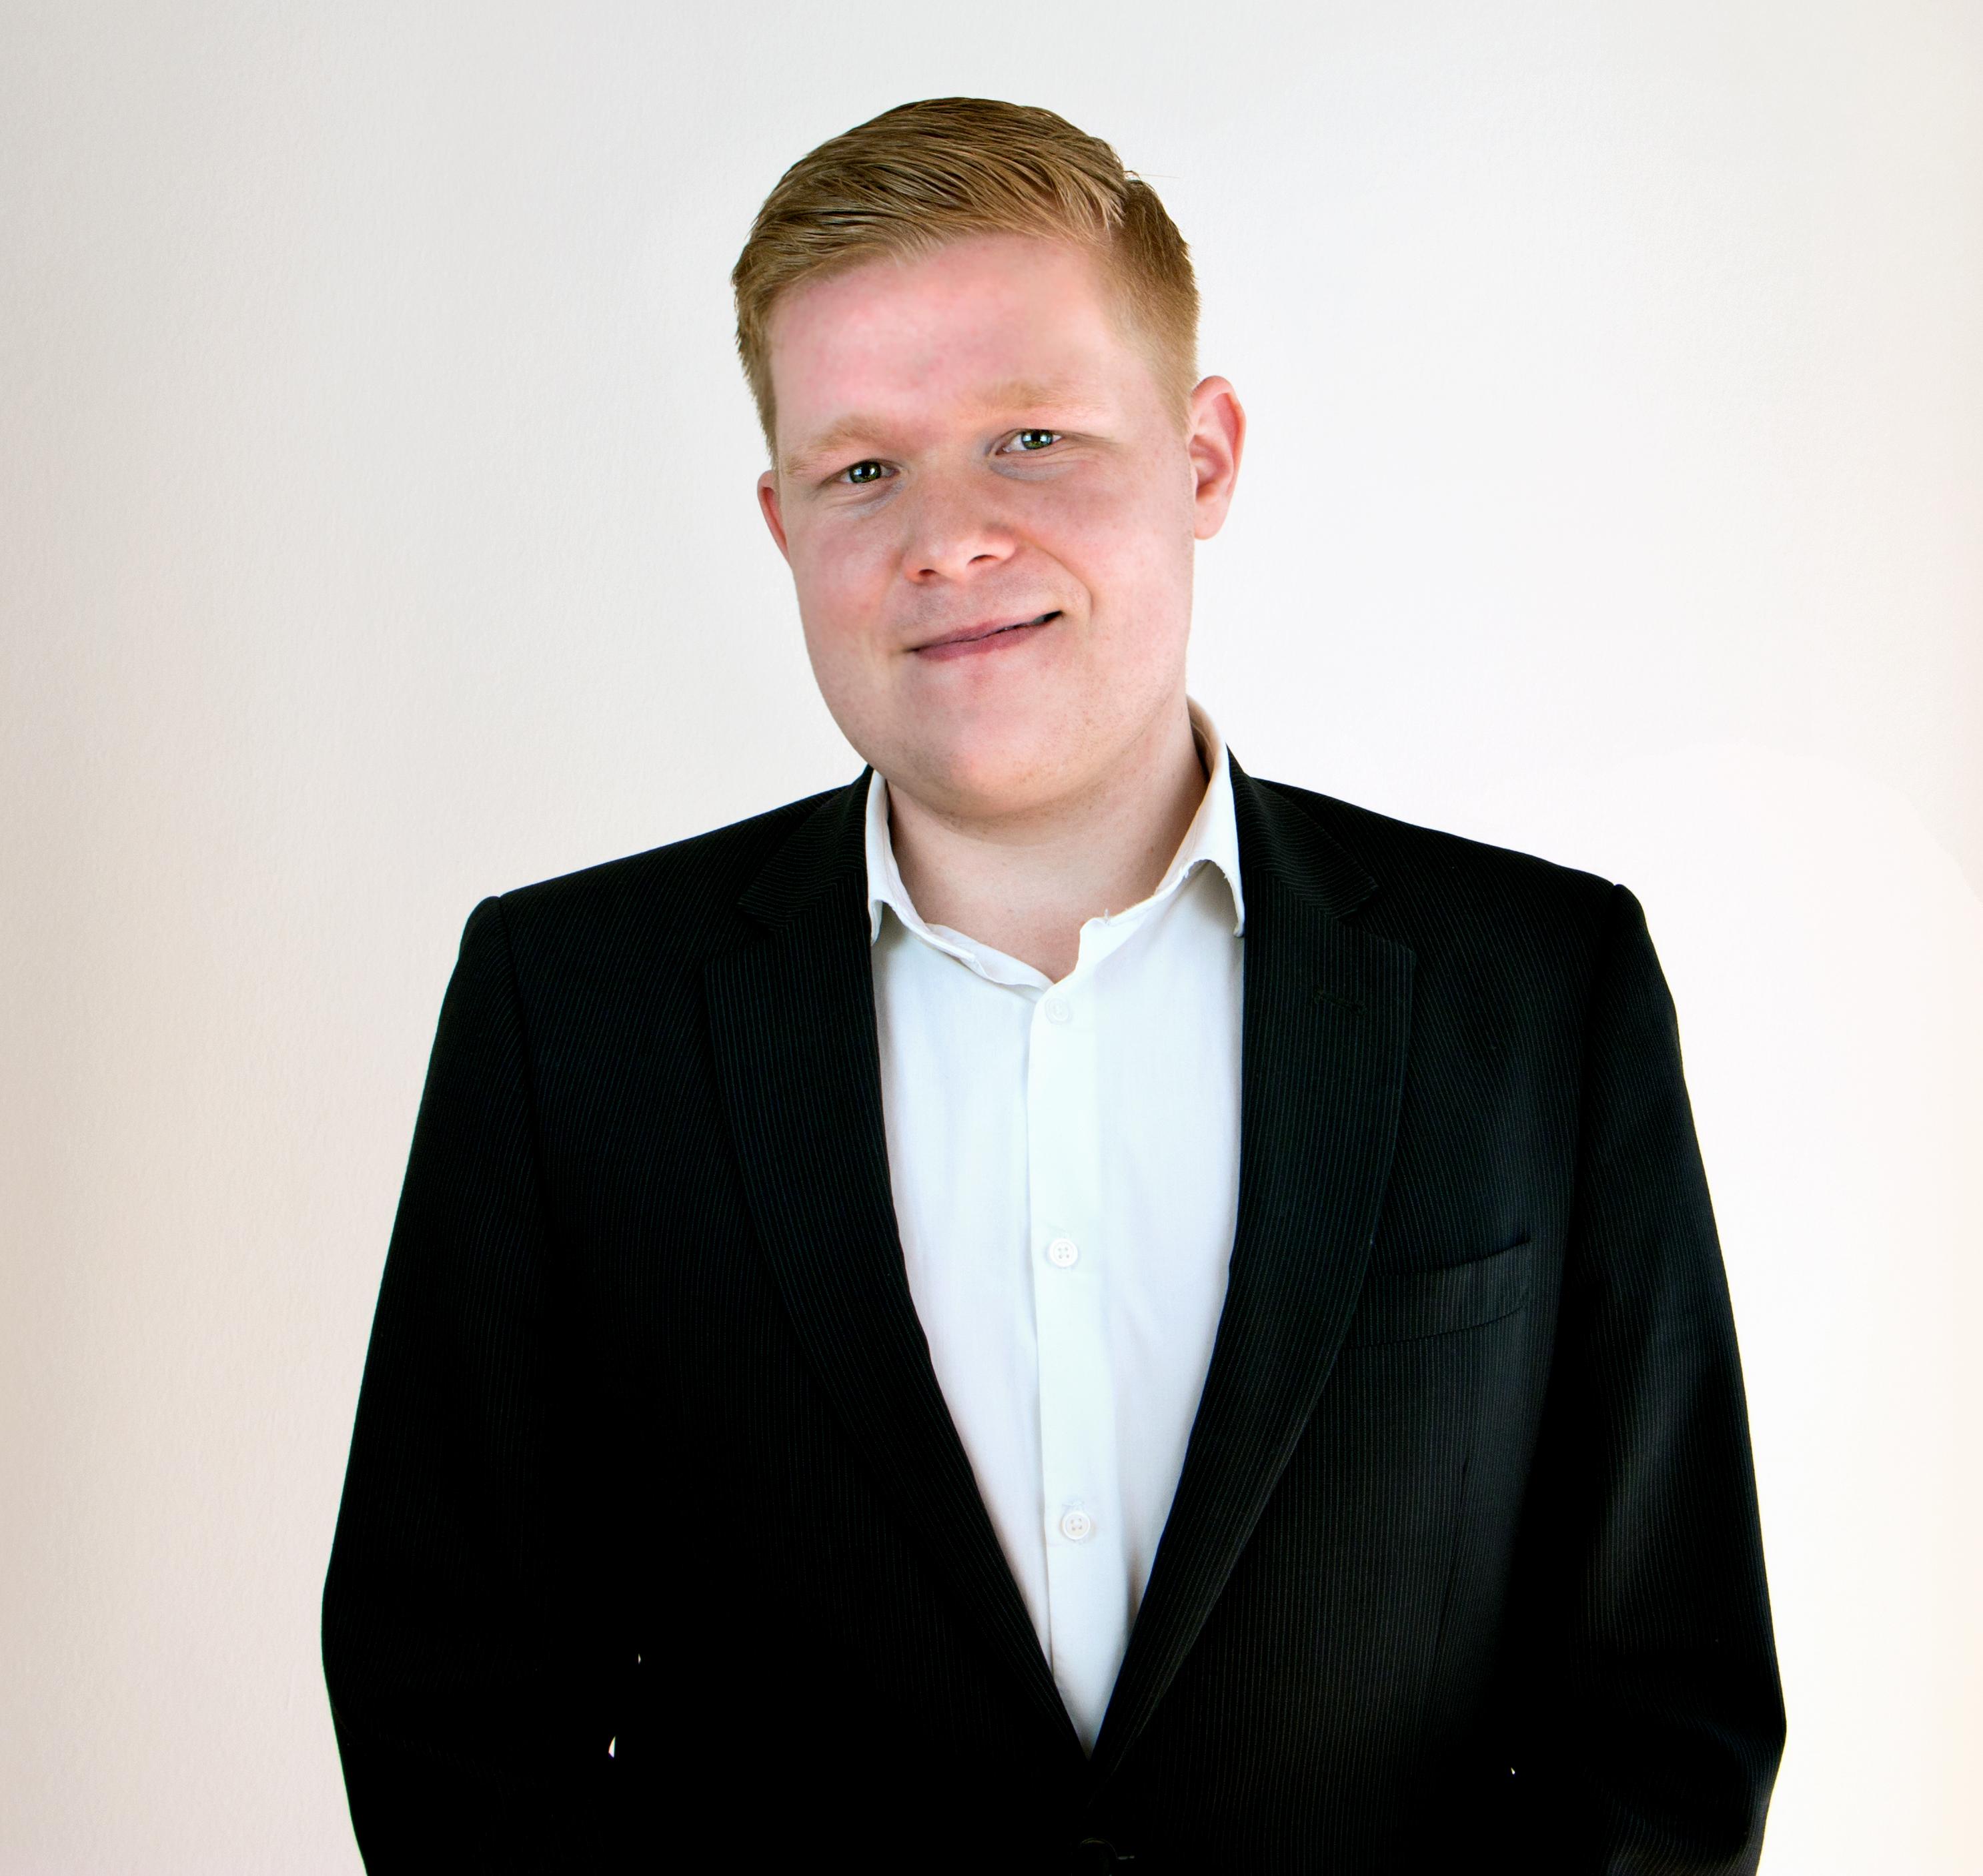 Rene Kötting